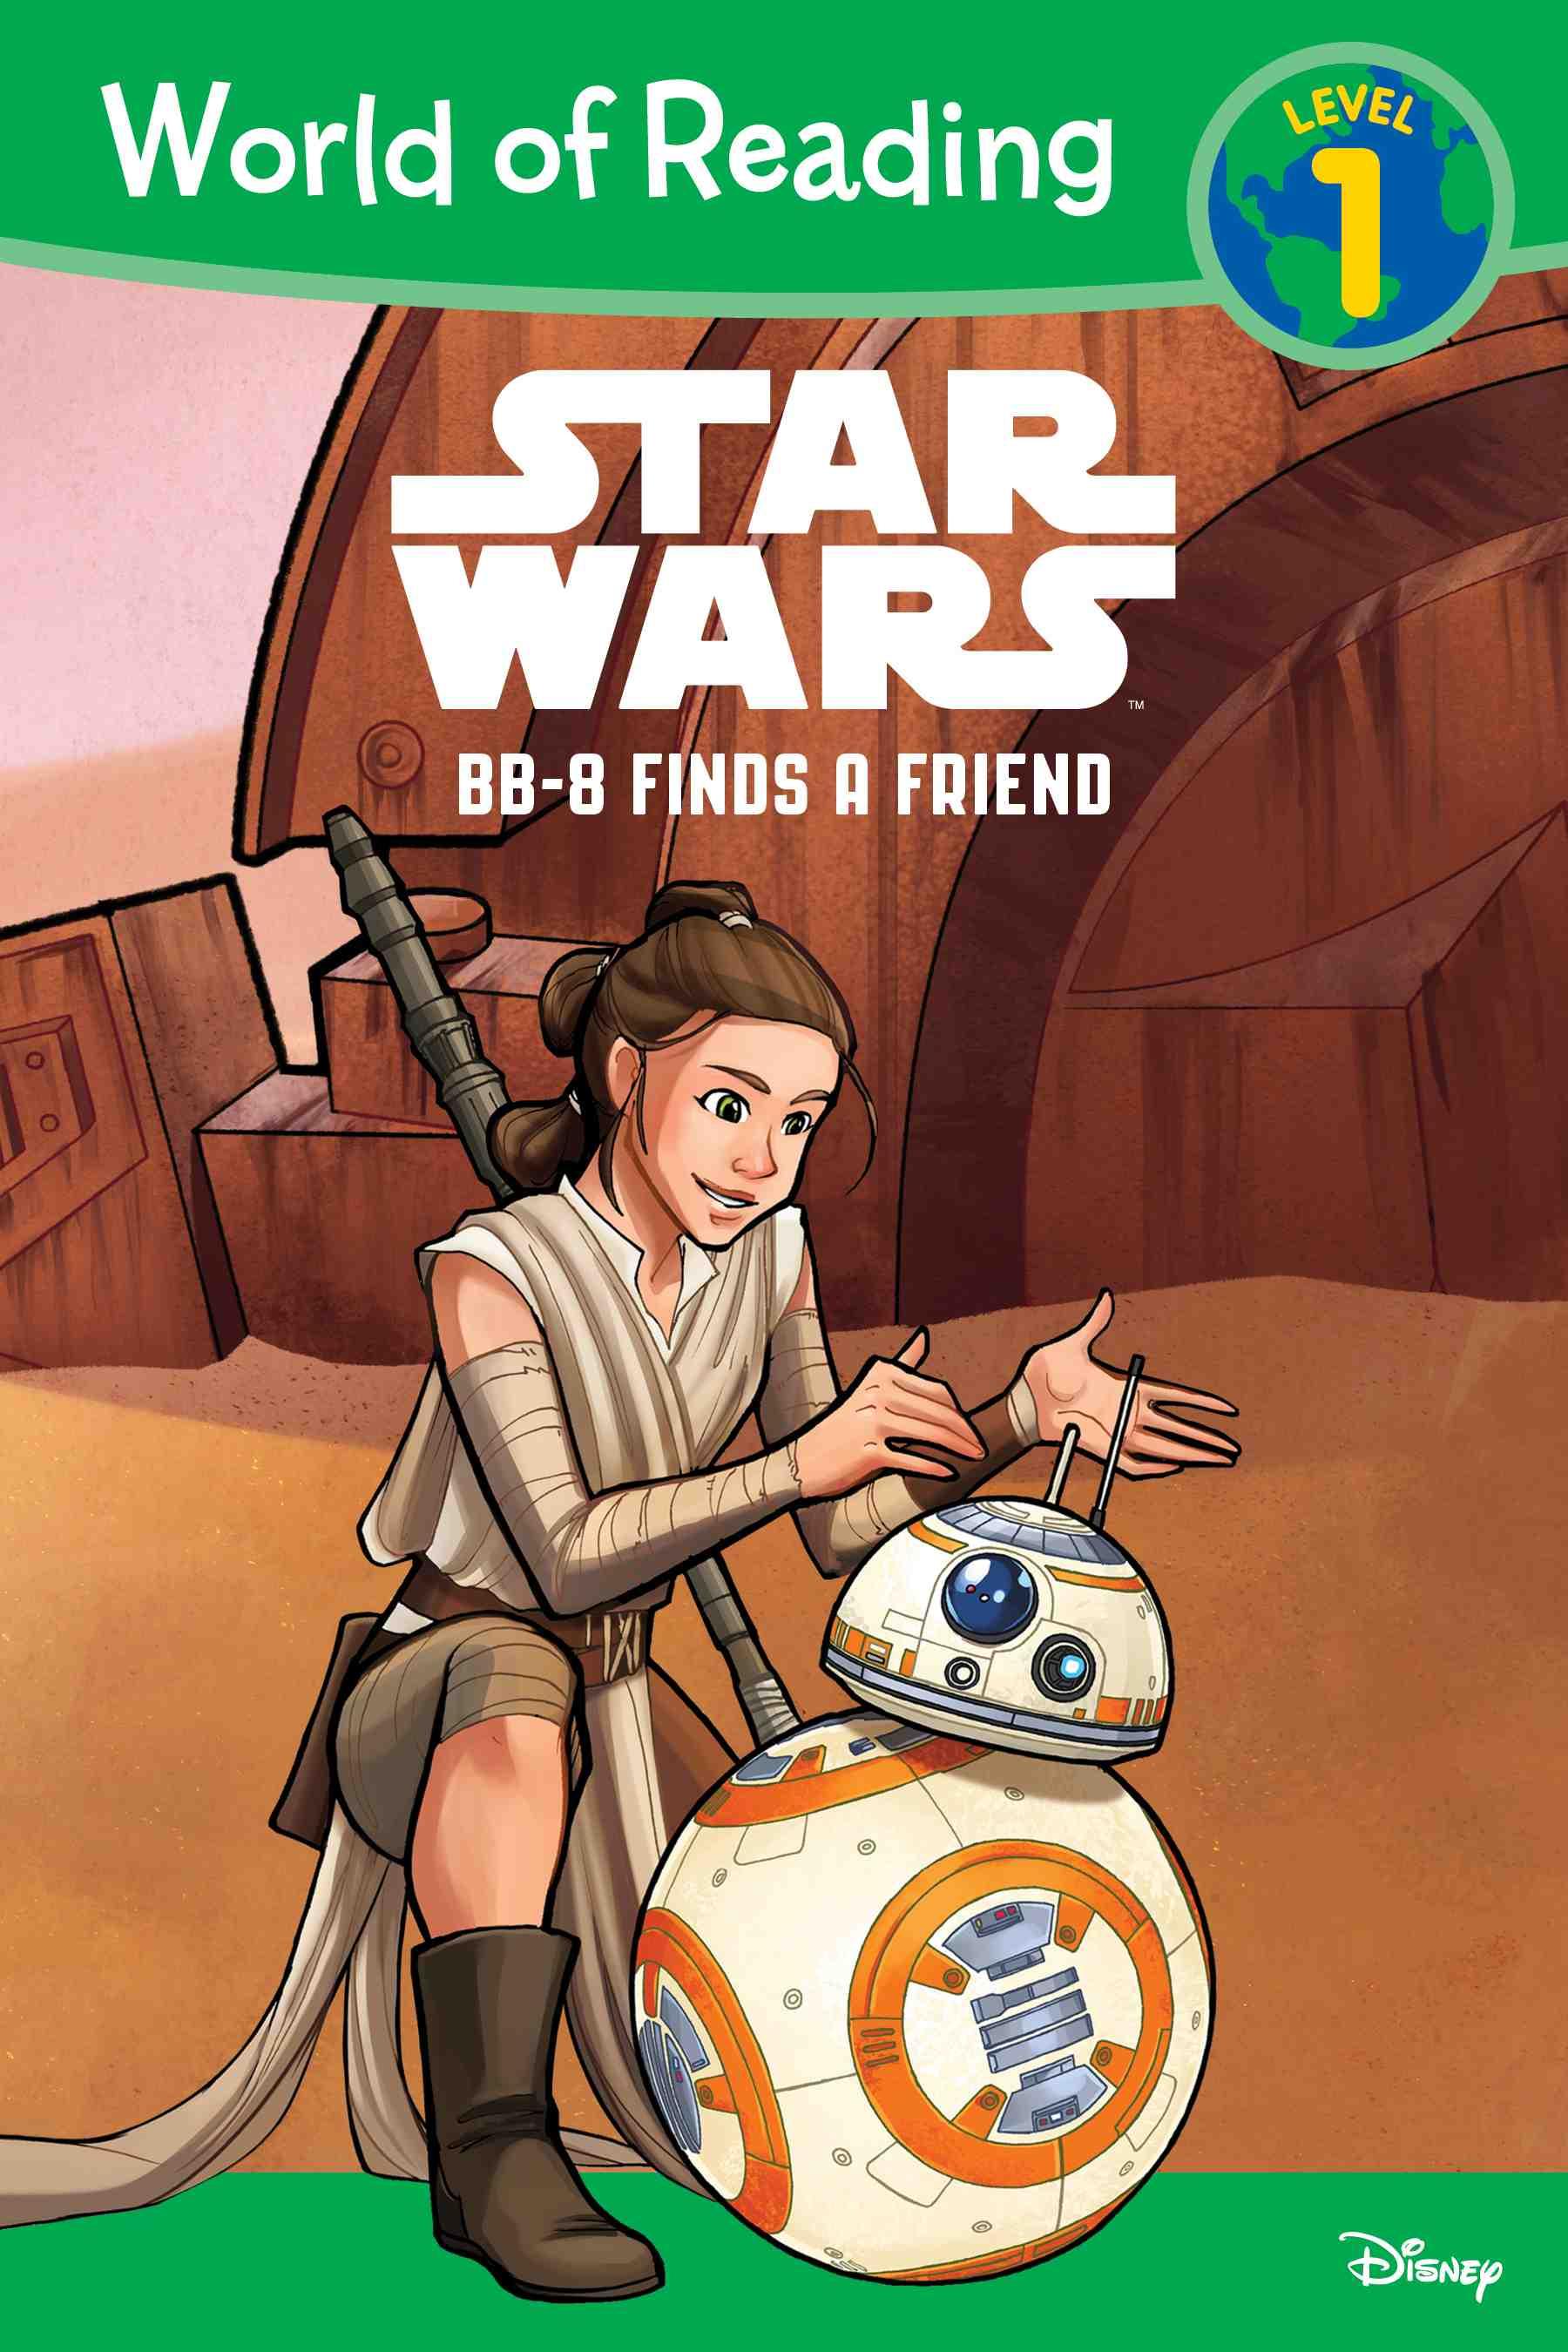 BB-8 находит друга